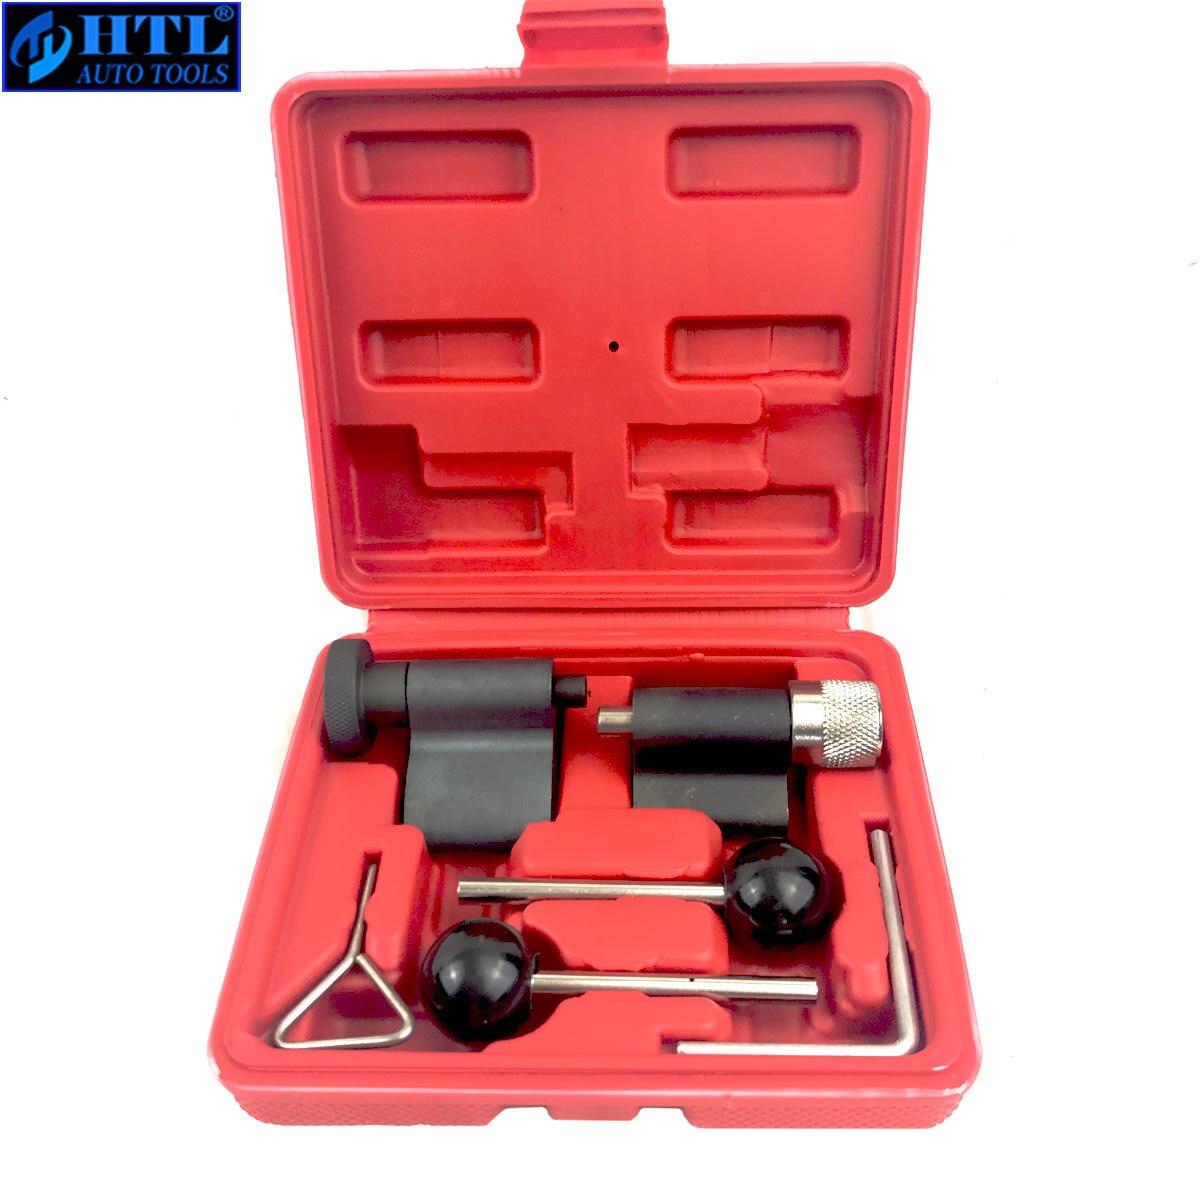 6pc Universal Motor Diesel Sincronismo Cam Crank Locking Tool Set Para VW AUDI T10050 T10100